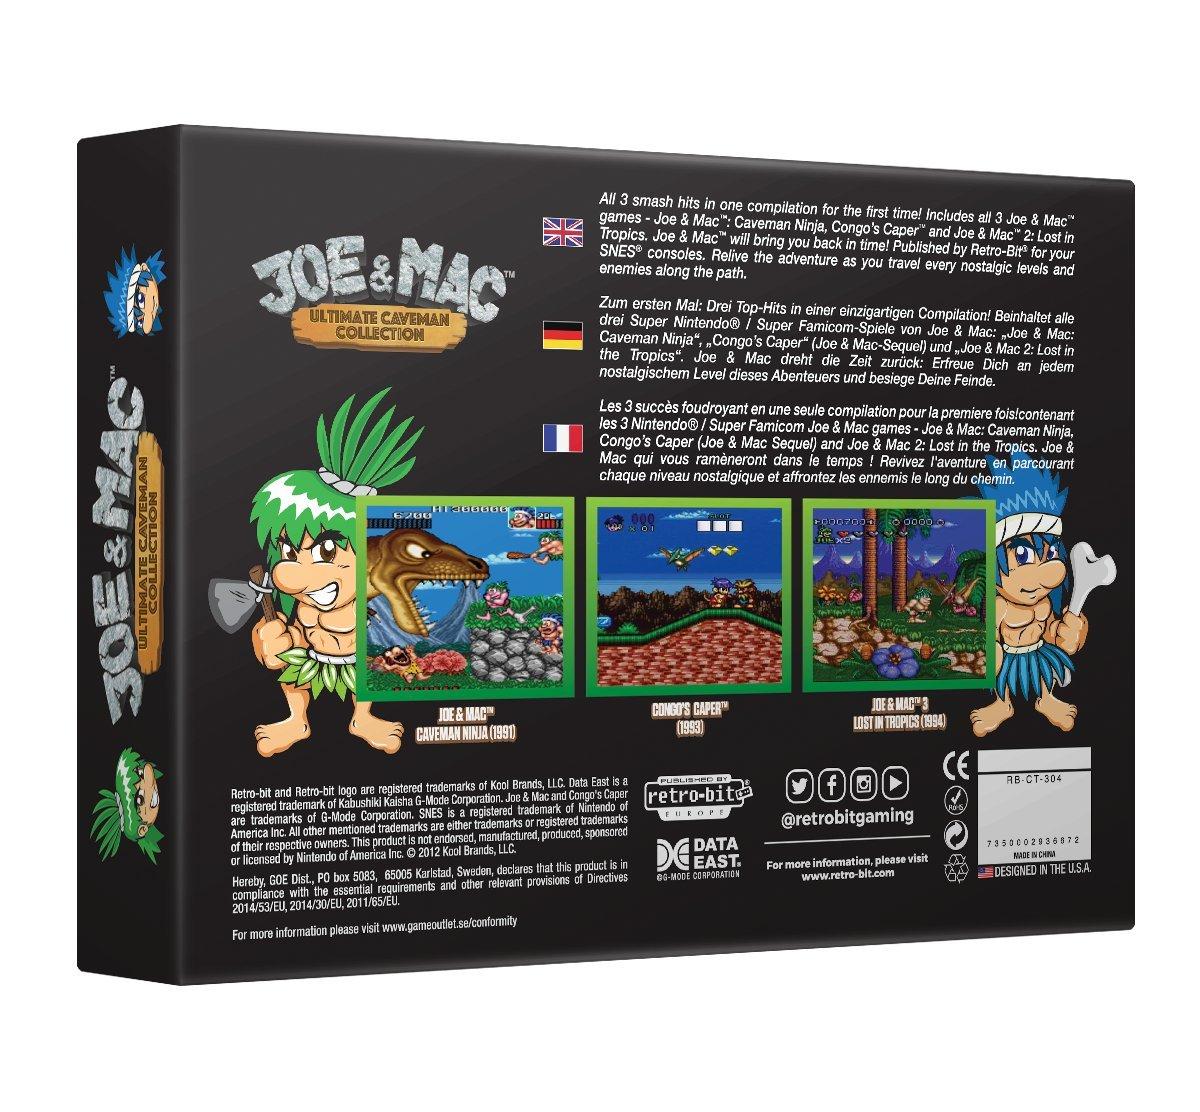 Amazon.com: Retro-Bit Europe Joe and Mac Ultimate Caveman ...